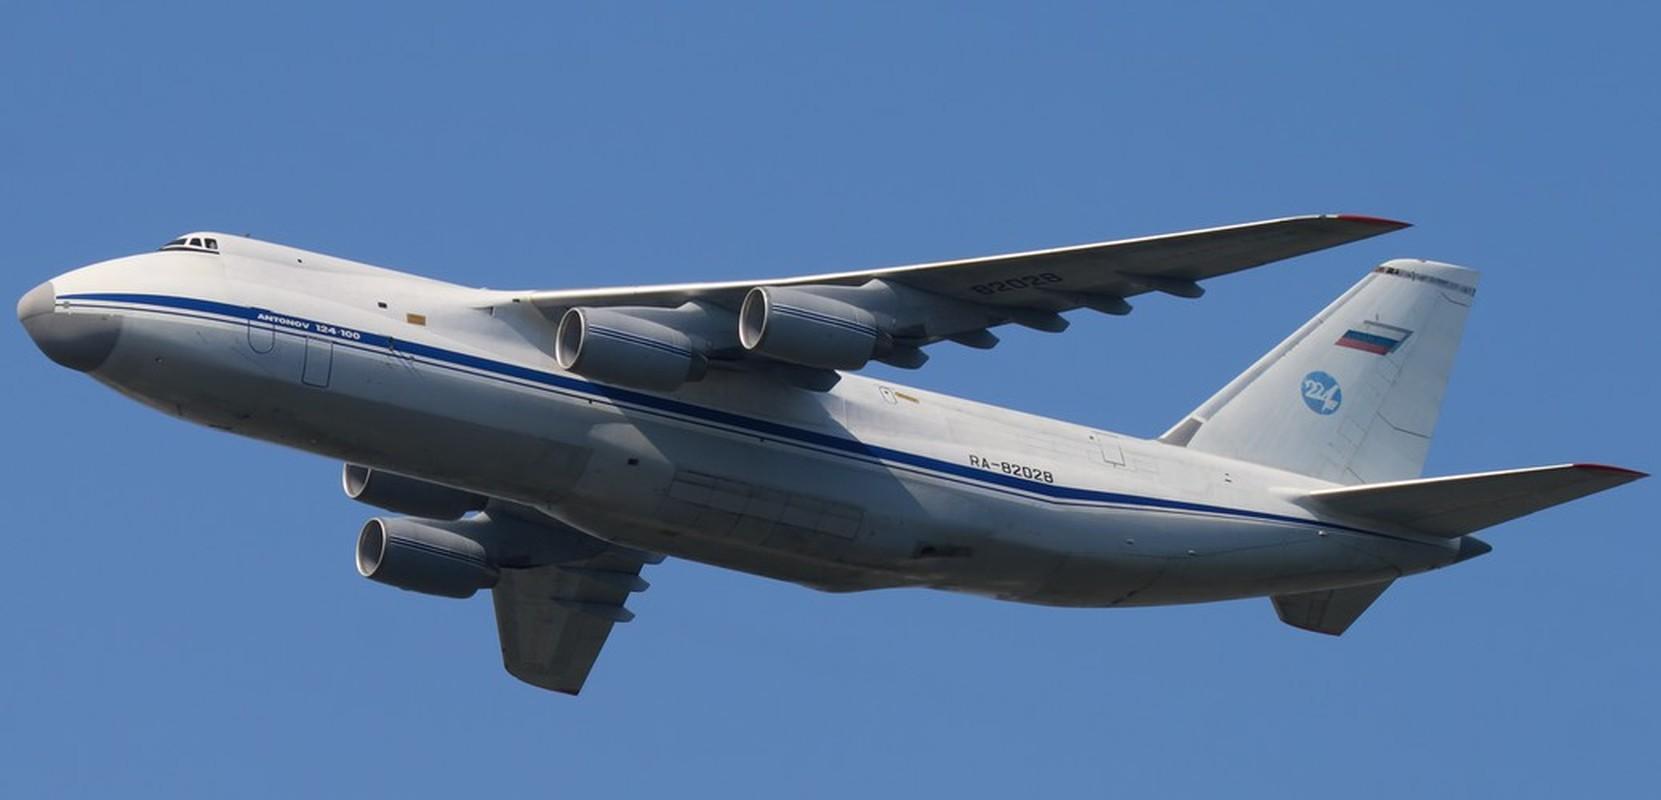 Nga kho khan khi nang cap may bay An-124 do cang thang voi Ukraine-Hinh-7